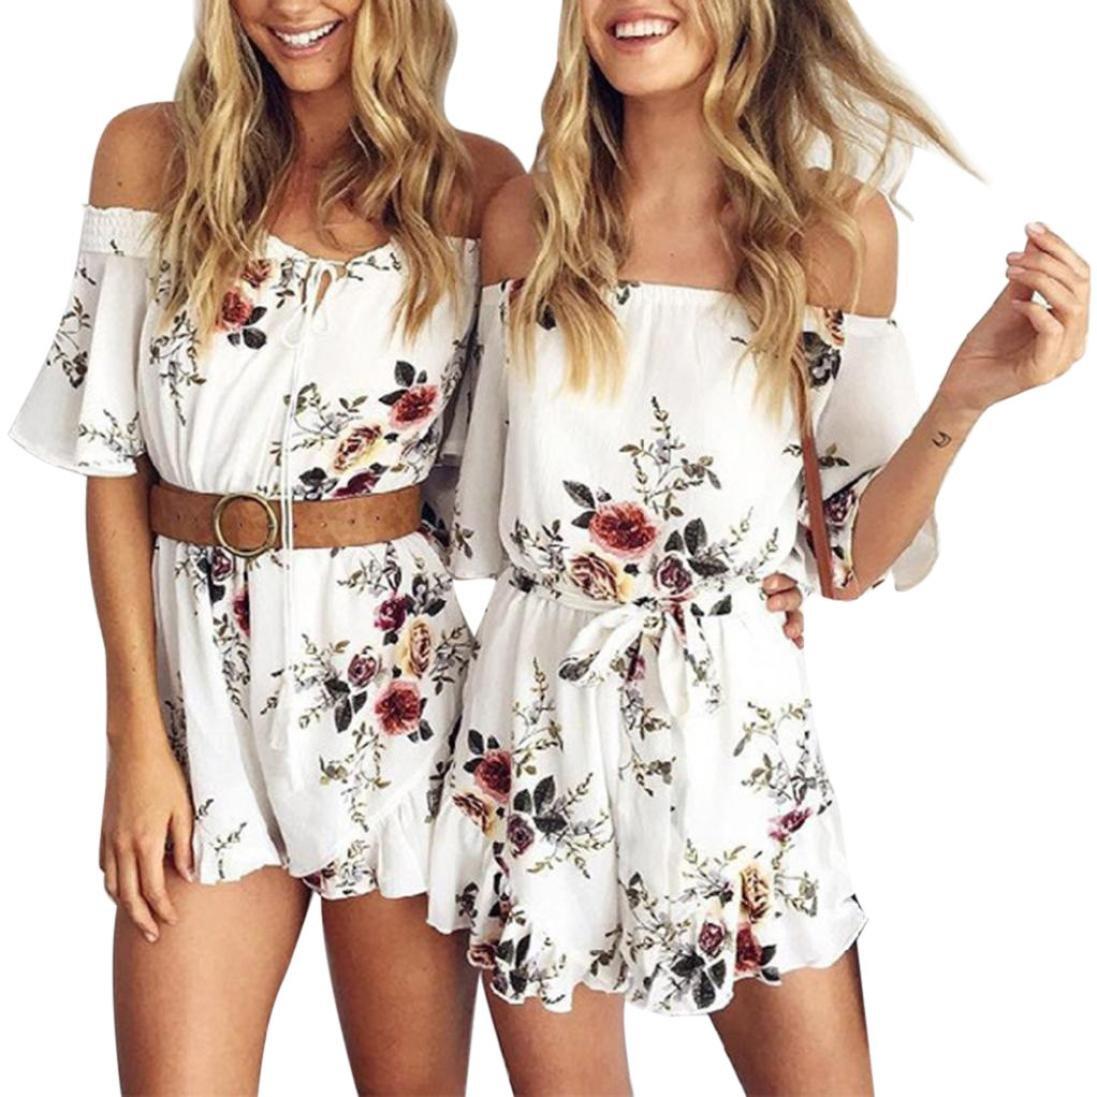 106a71622819b Amazon.com  Women Floral Print Short Beach Sexy Off Shoulder Jumpsuit  Rompers Shorts Playsuit  Clothing